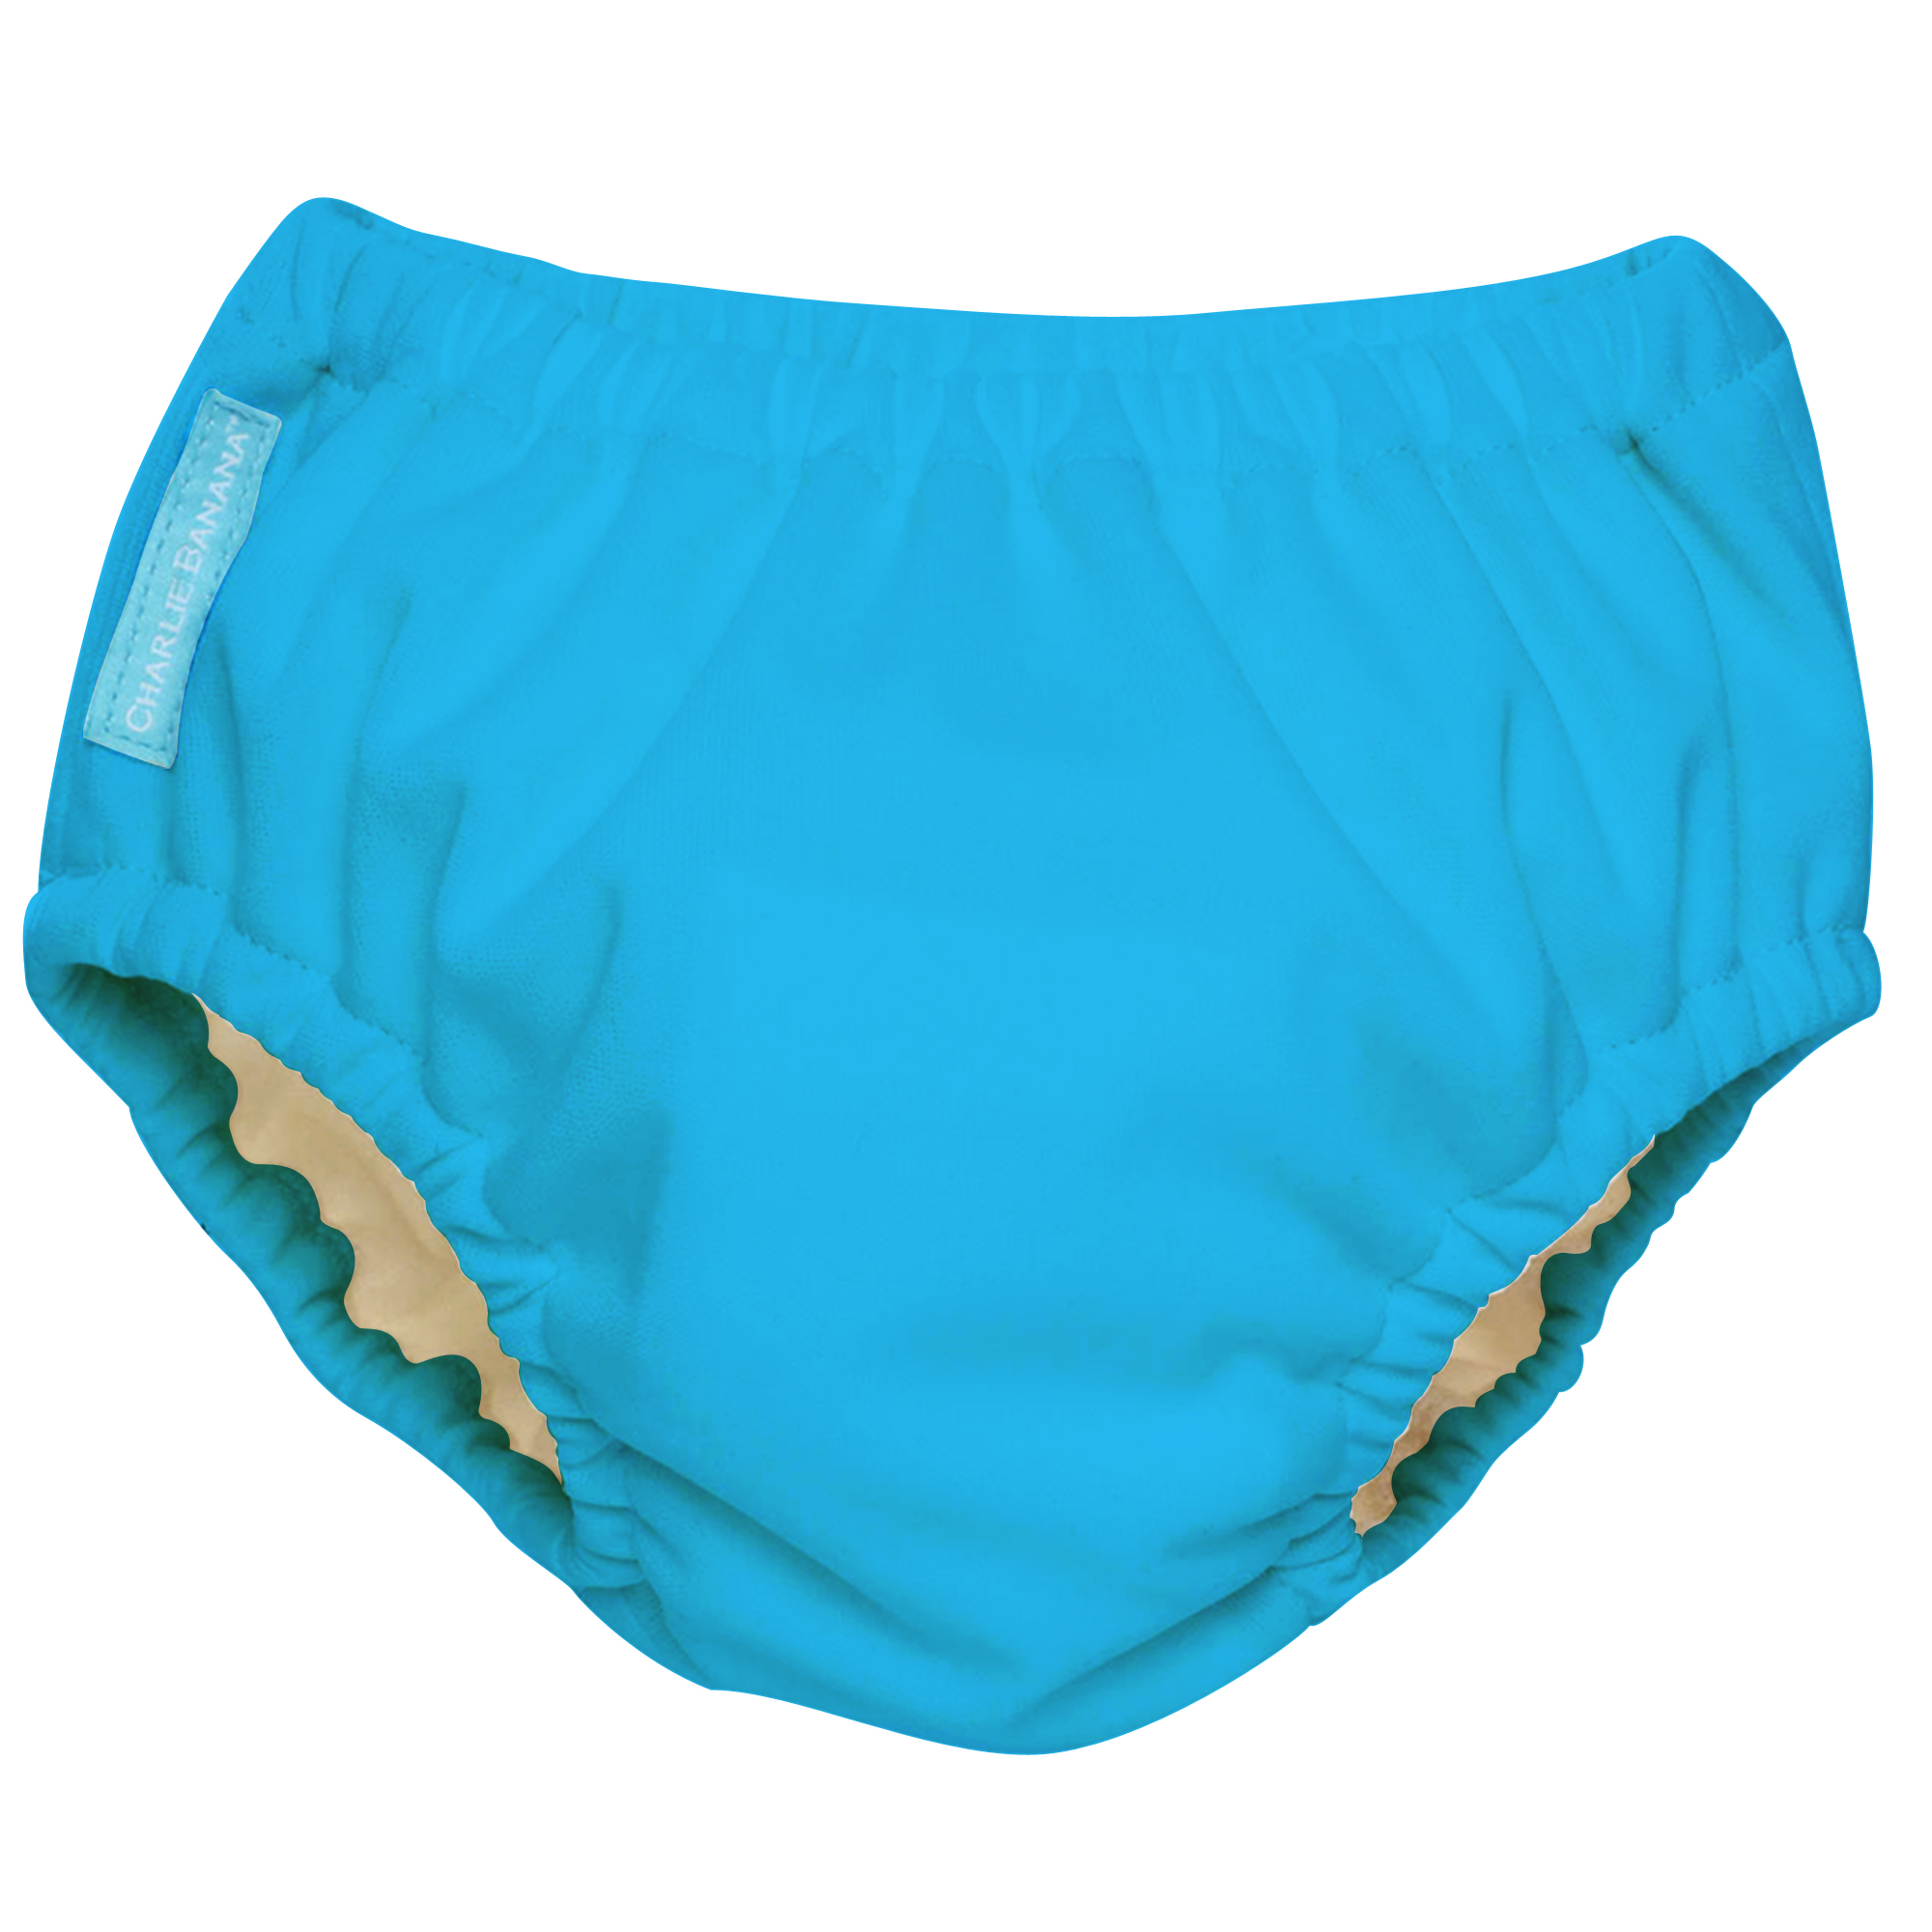 Charlie Banana Reusable Swim Diaper, Turquoise (Choose Size)